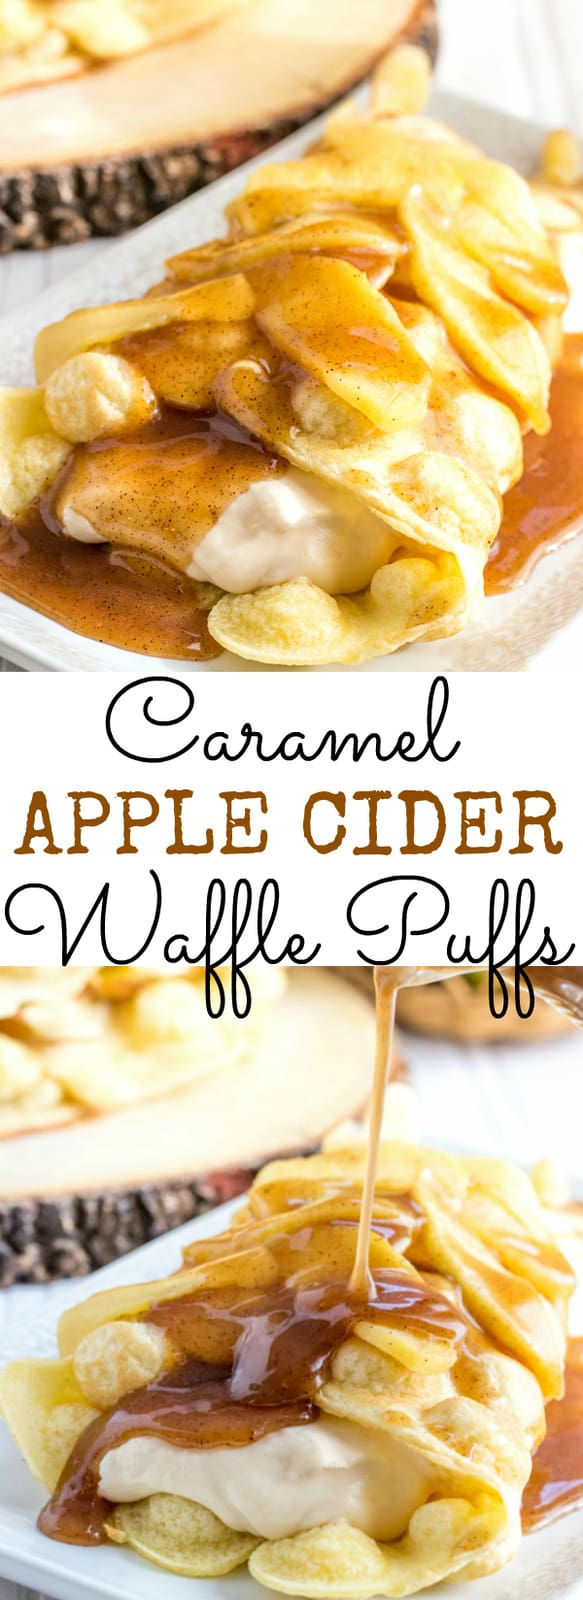 Caramel Apple Cider Waffle Puffs